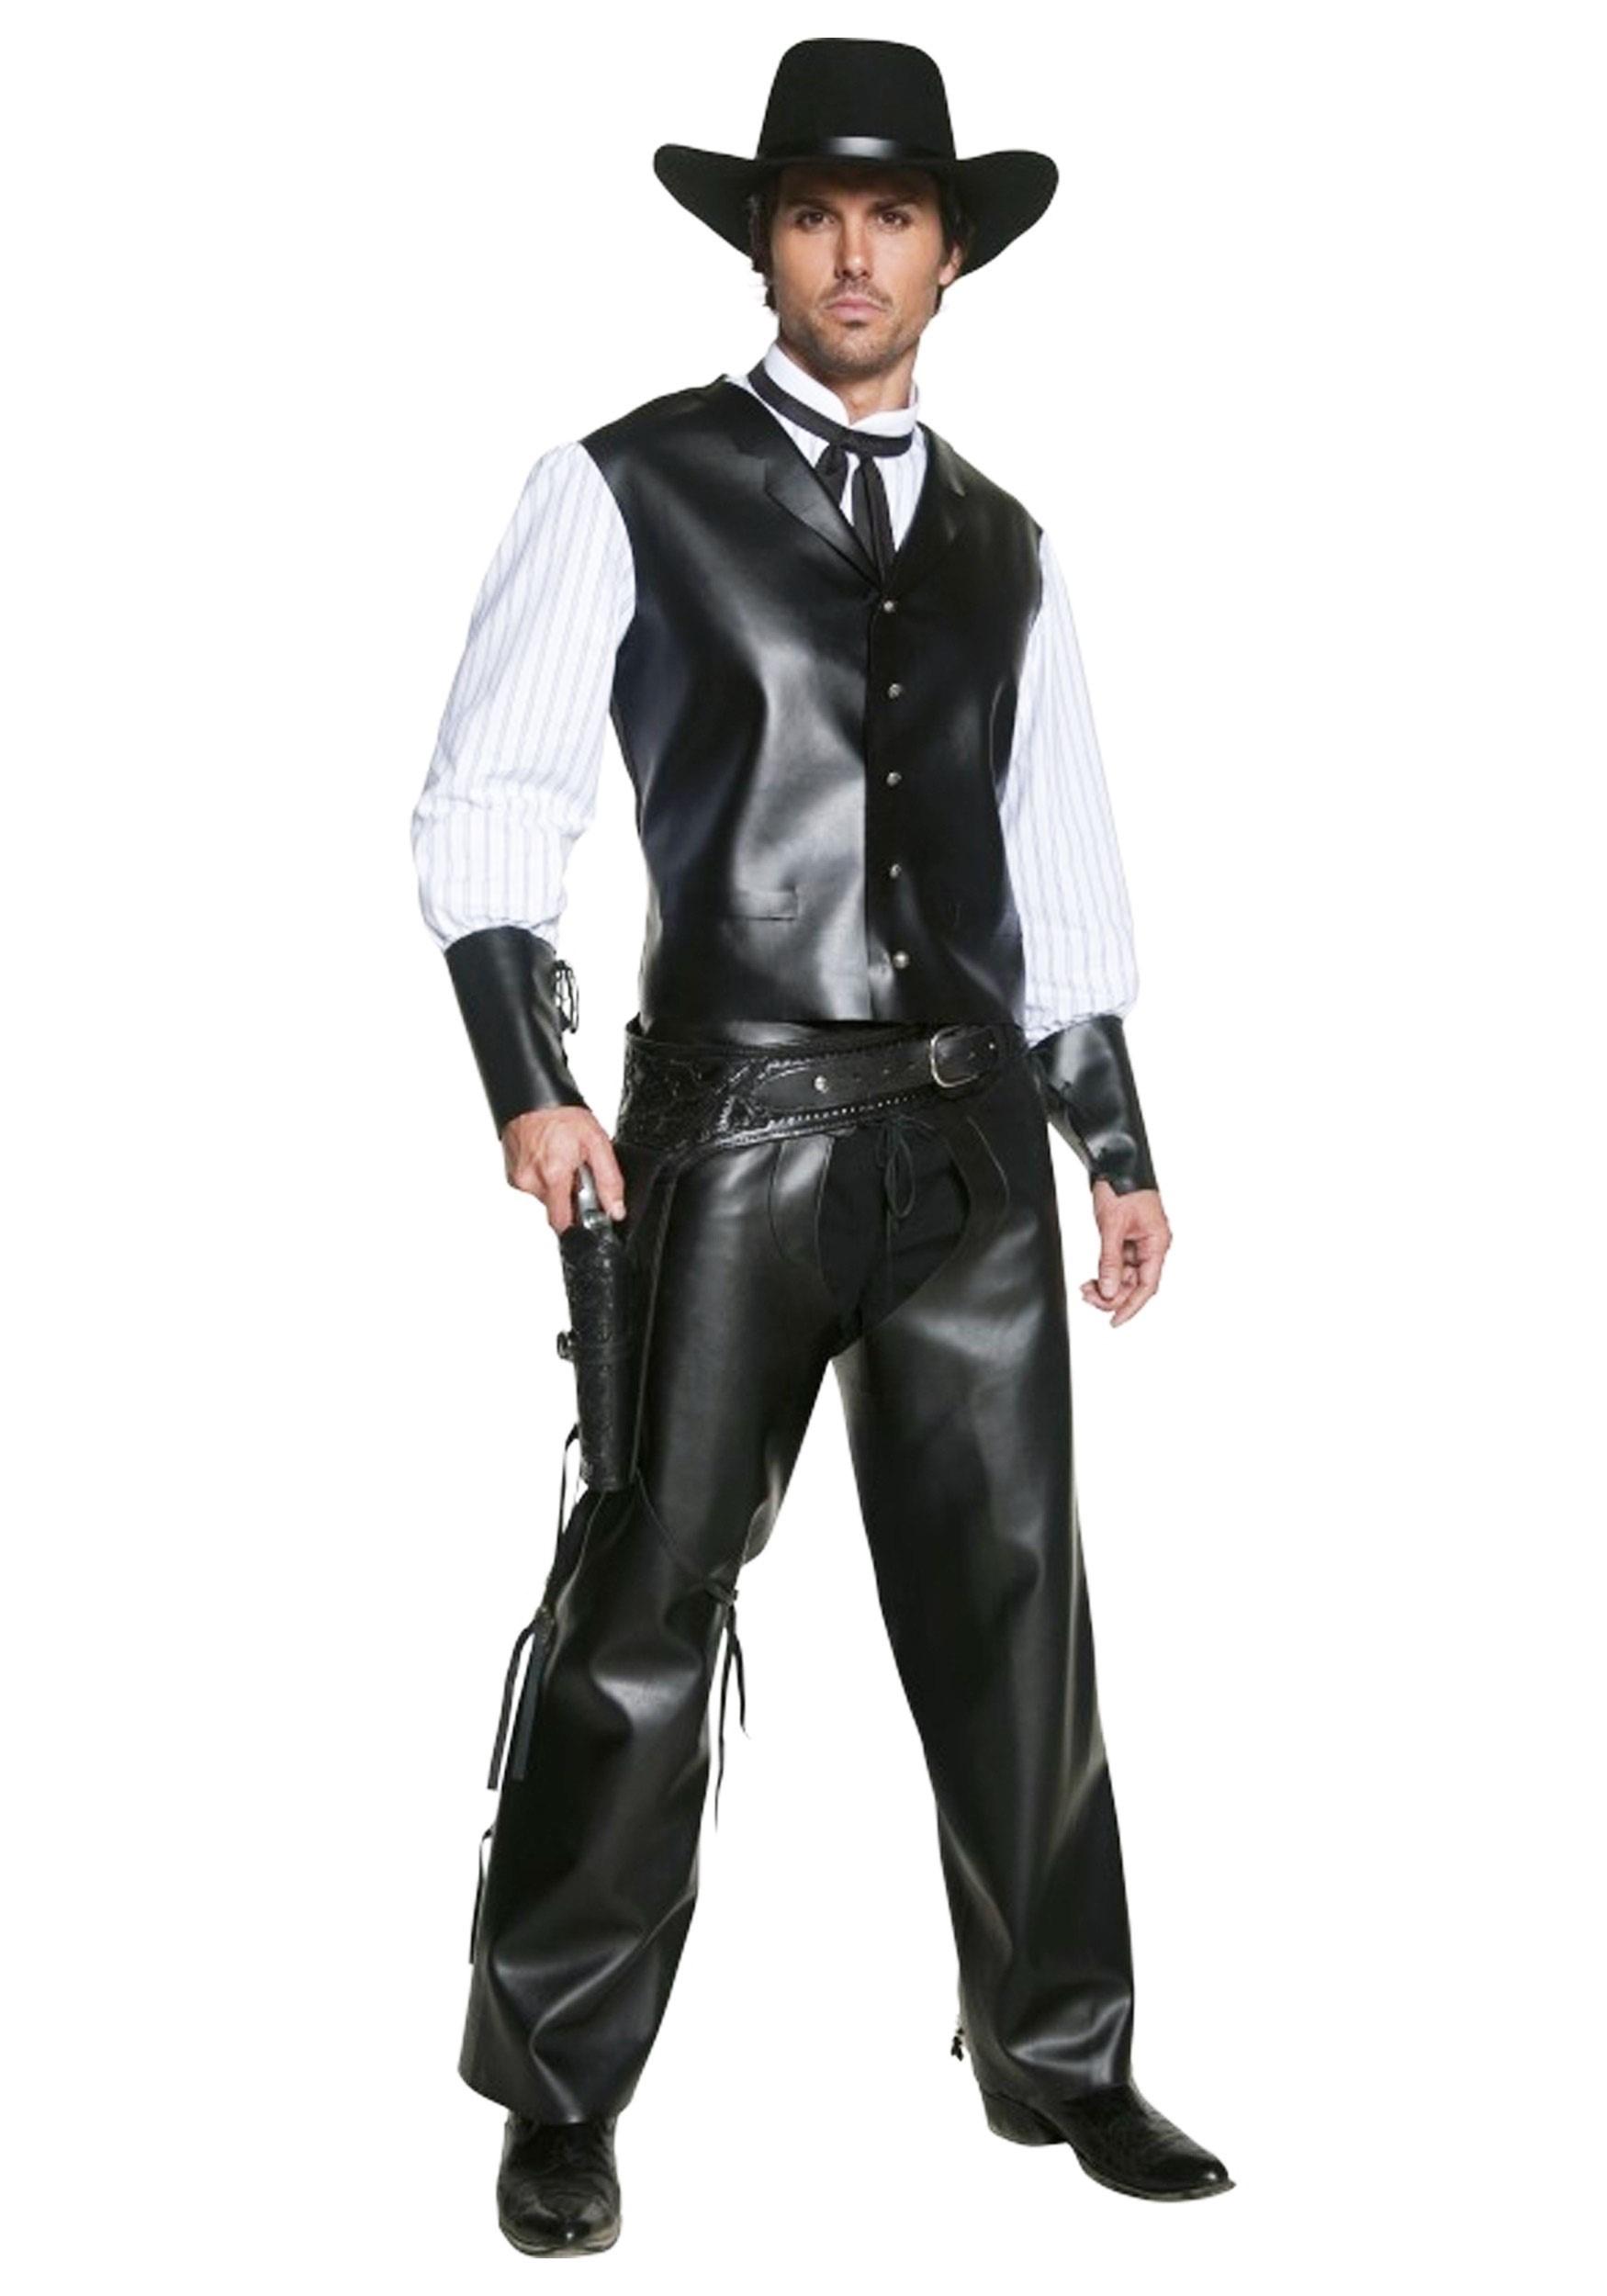 Authentic Western Gunslinger Costume  sc 1 st  Halloween Costumes UK & Western u0026 Cowboy Costumes - HalloweenCostumes.com